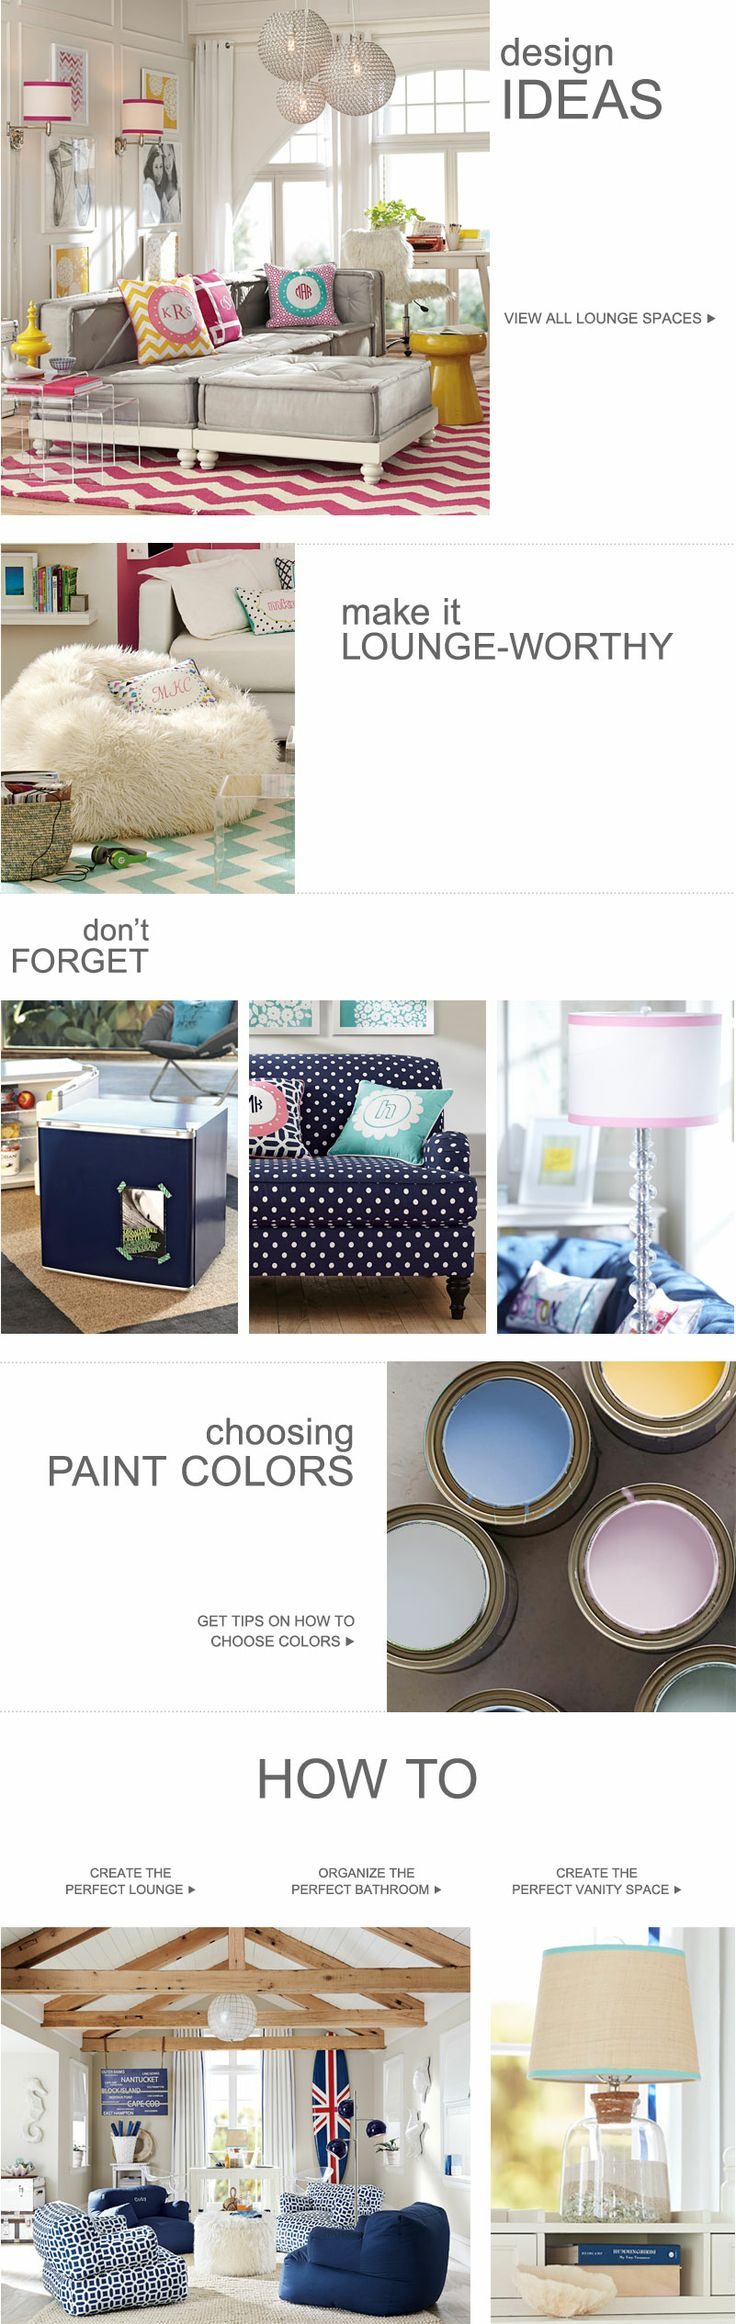 Hang Out Room Ideas 10 Best Teen Hangout Room Images On Pinterest Teen Hangout Room